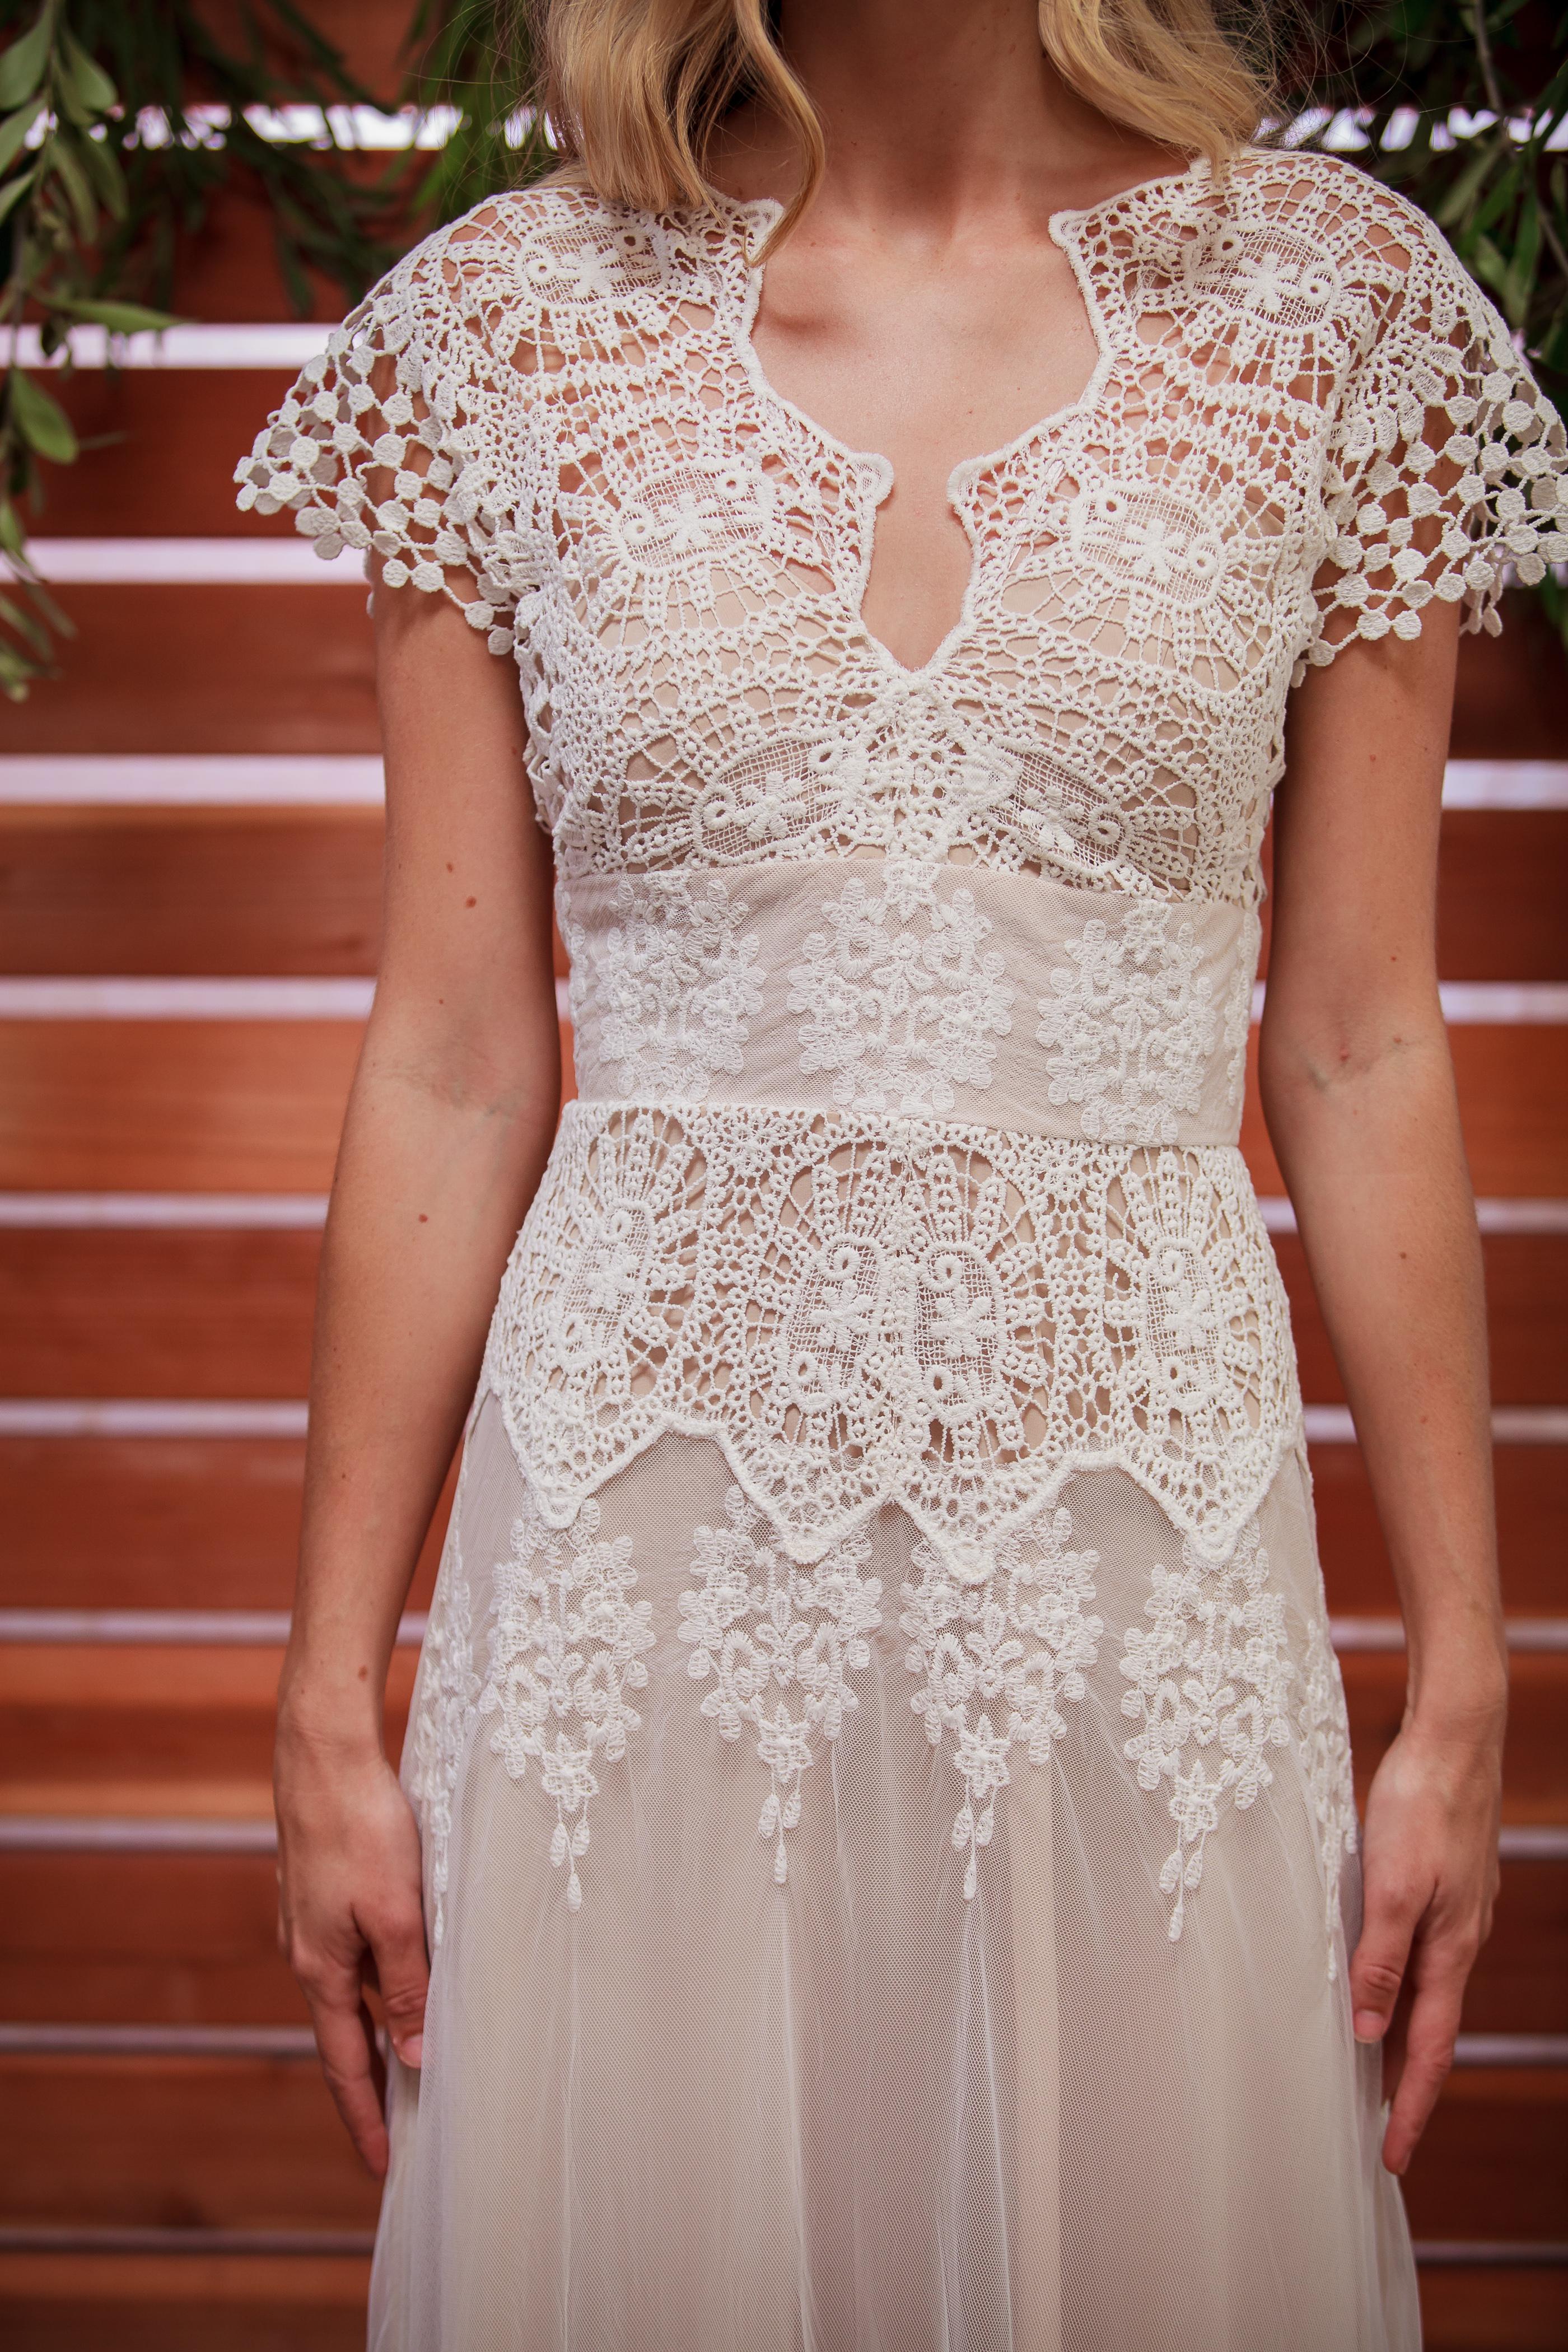 Azalea Boho Cotton Lace Wedding Dress | Dreamers and Lovers